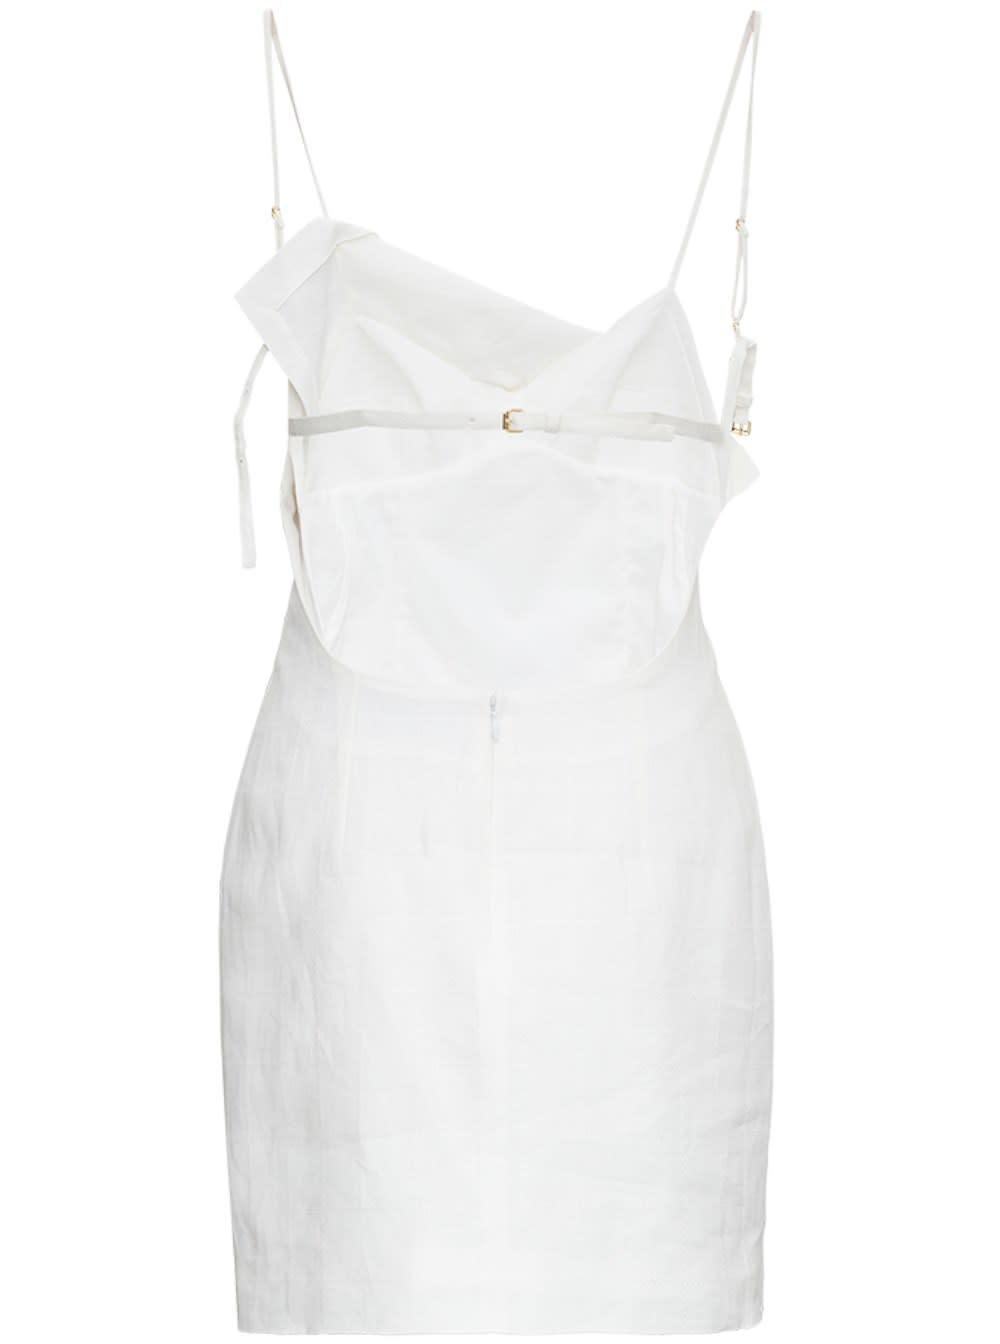 Buy Jacquemus La Robe Drap White Linen Dress online, shop Jacquemus with free shipping